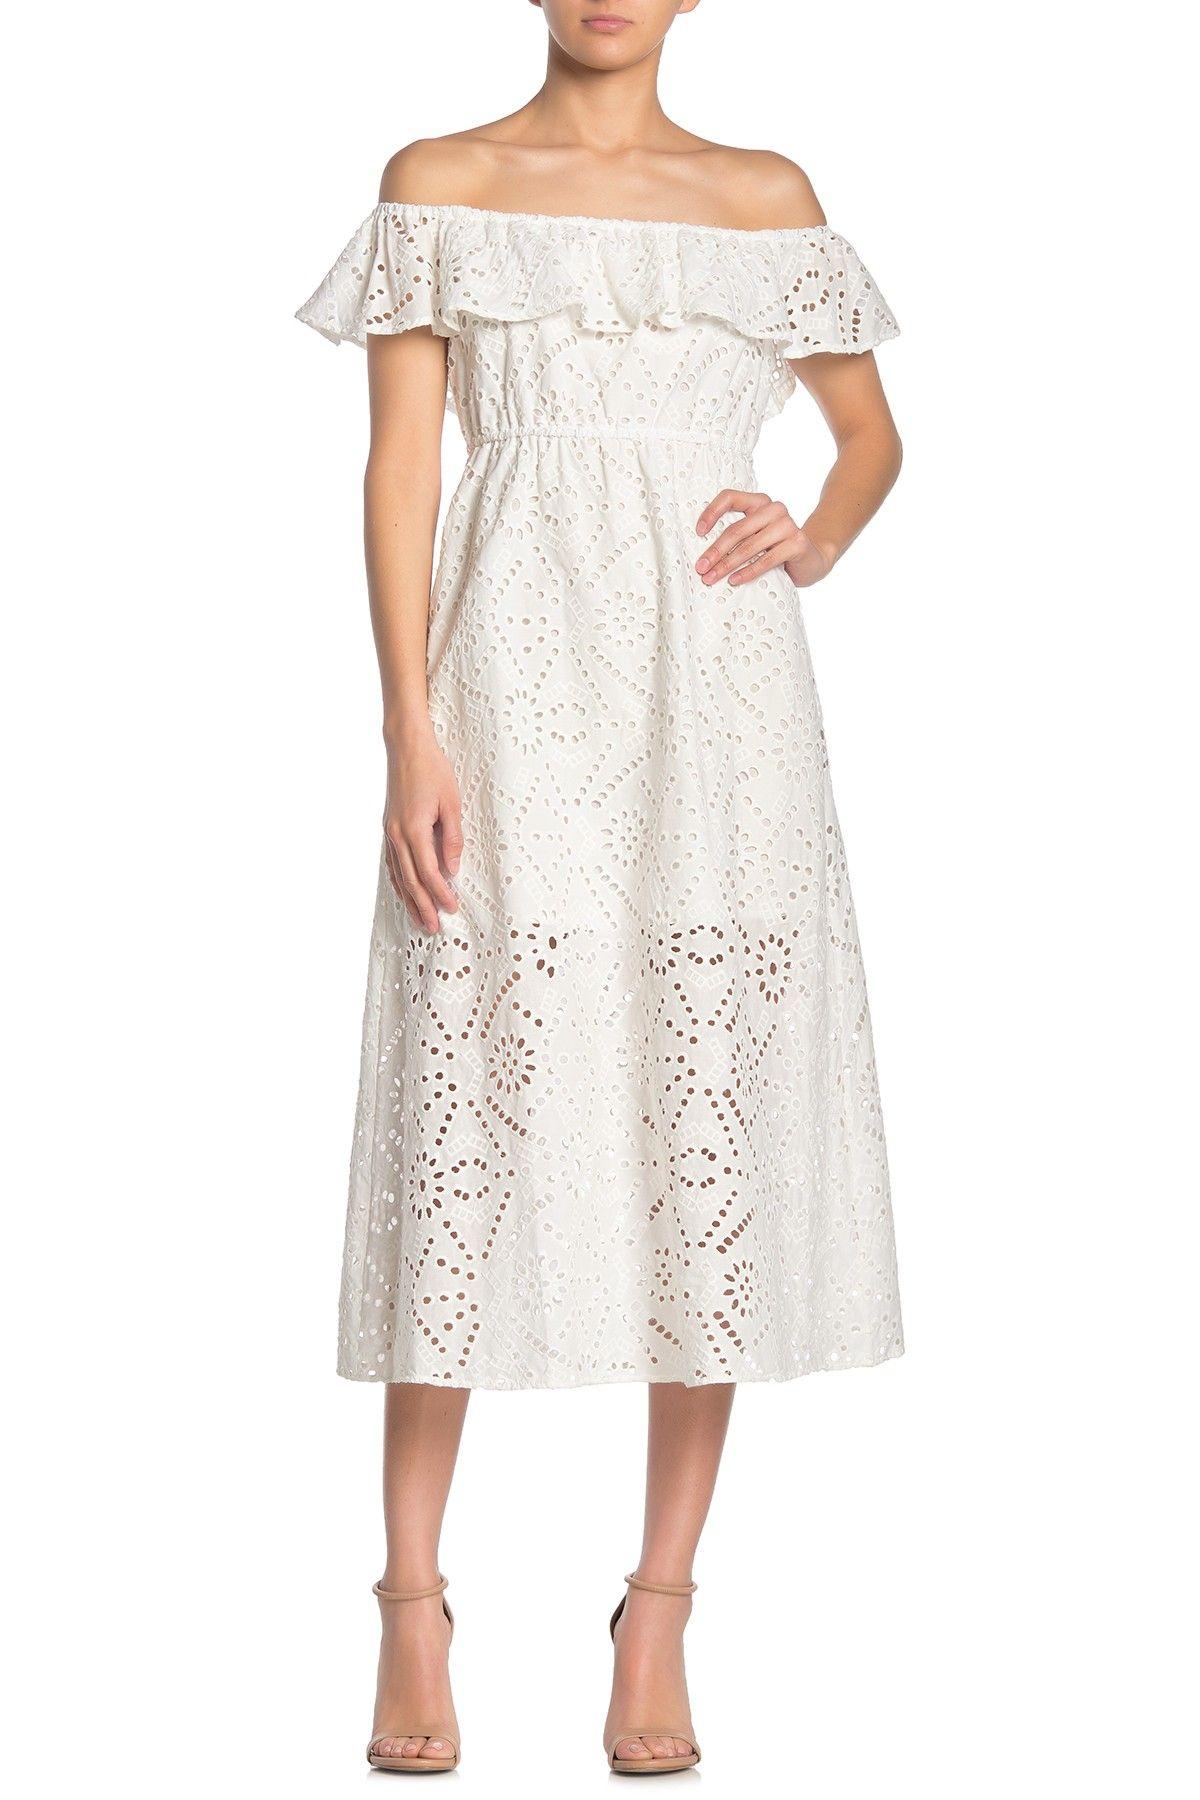 Abound Off The Shoulder Eyelet Midi Dress Nordstrom Rack Midi Dress Knit Midi Dress Nordstrom Dresses [ 1800 x 1200 Pixel ]